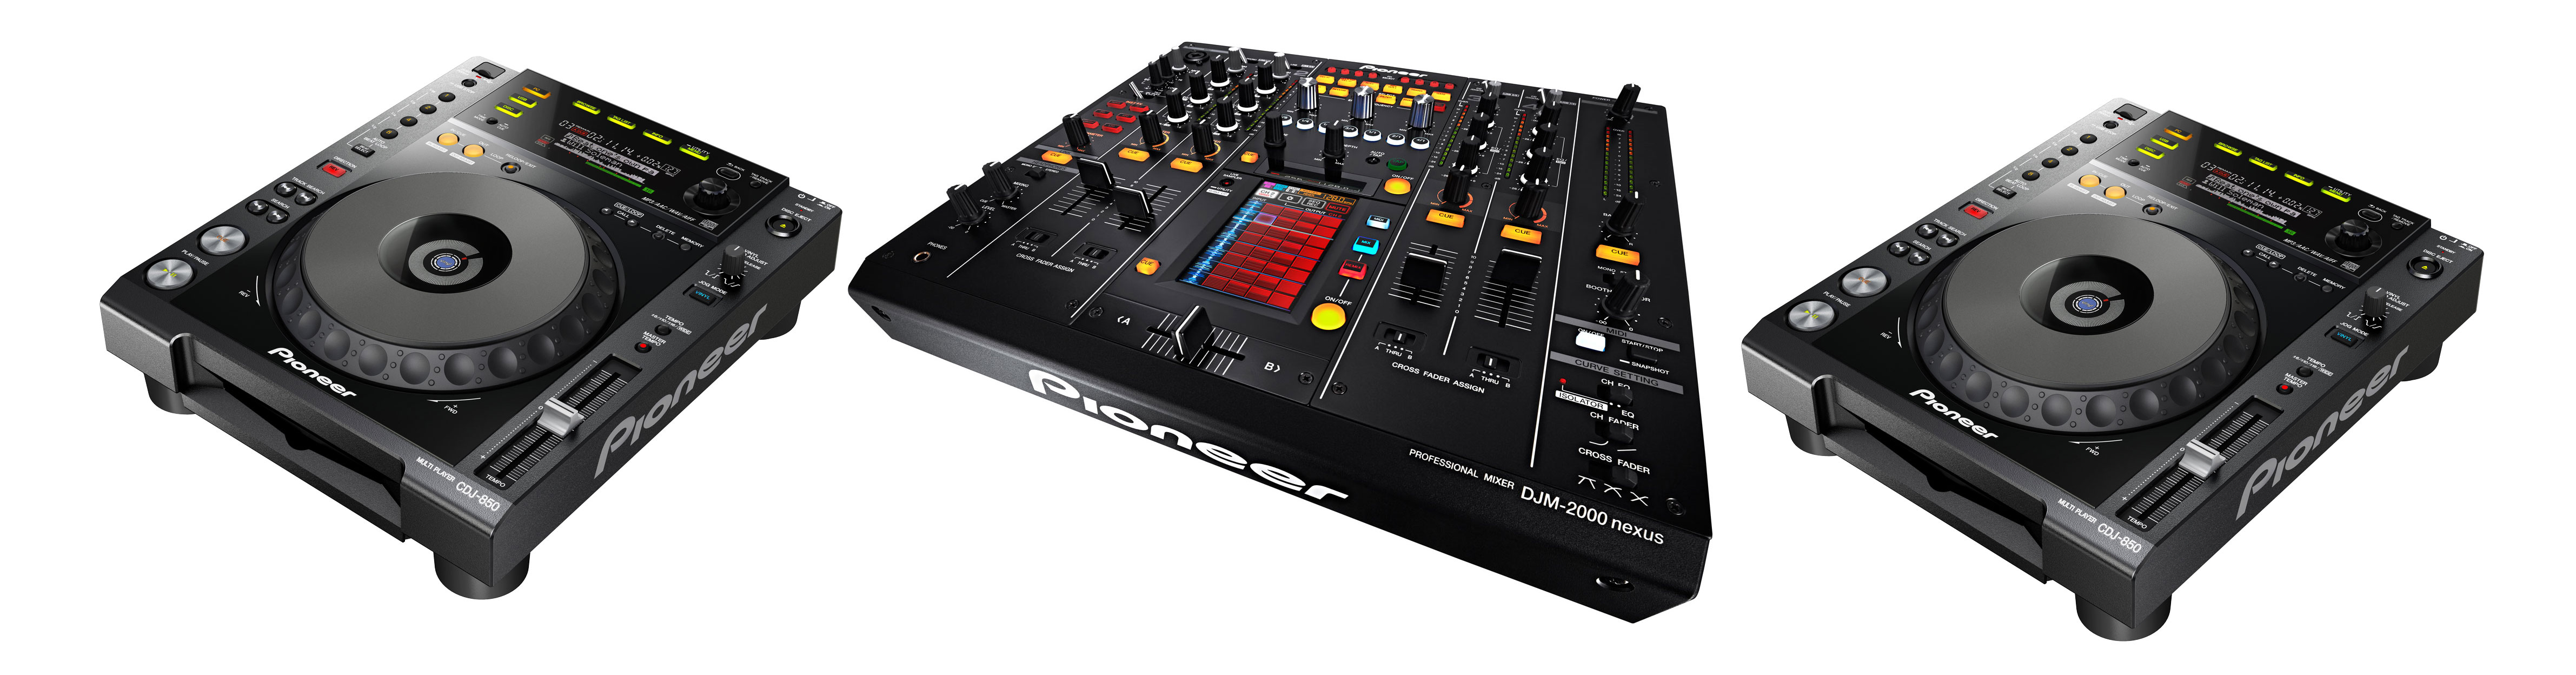 Pioneer DJ 2 x CDJ-850 + DJM-2000 Nexus + Flightcase